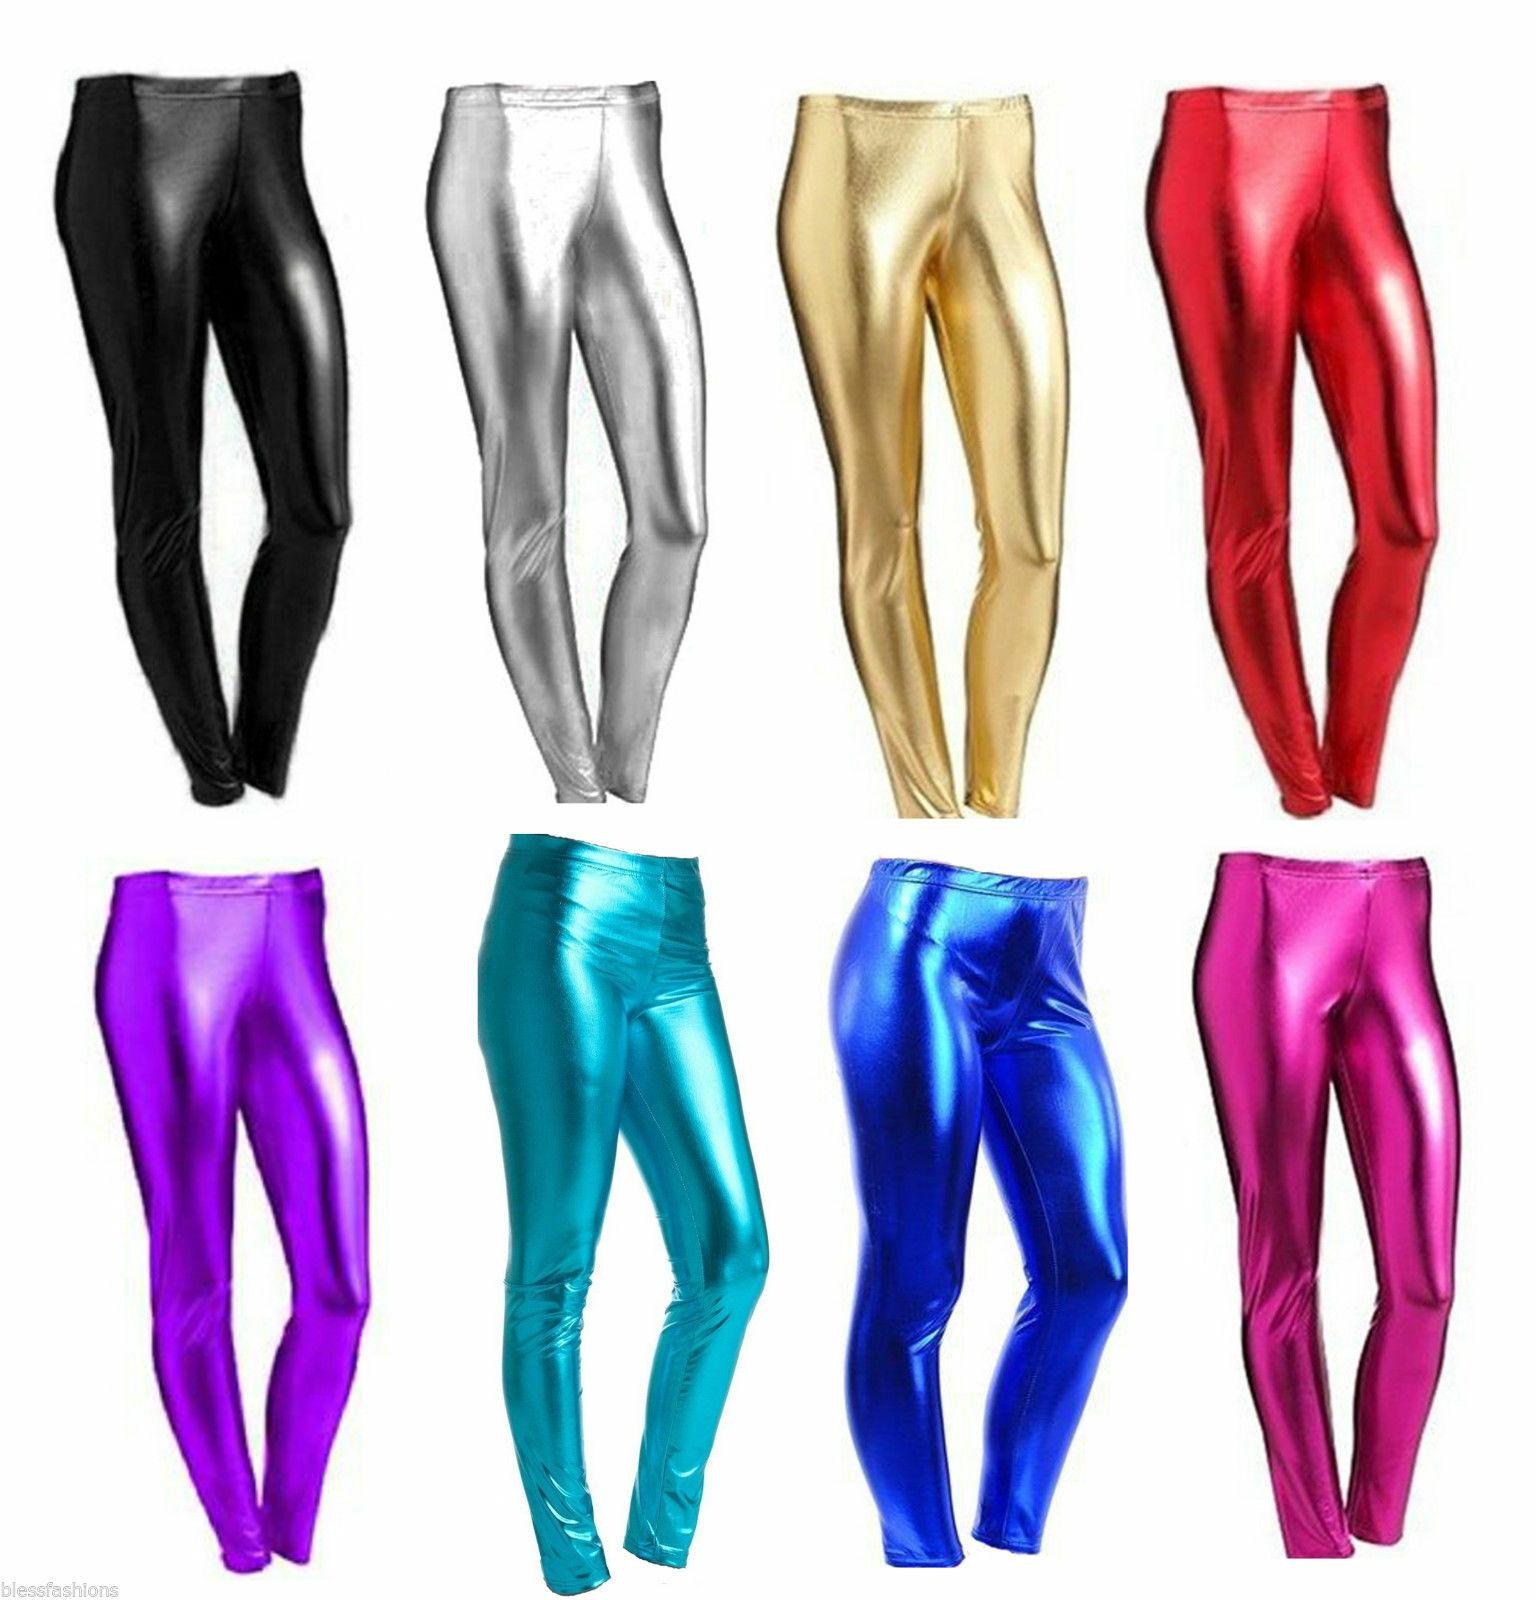 WOMENS WET LOOK METALLIC SHINY FOIL LEGGINGS LADIES GIRLS PLUS SIZE 3-13YRS 8-24